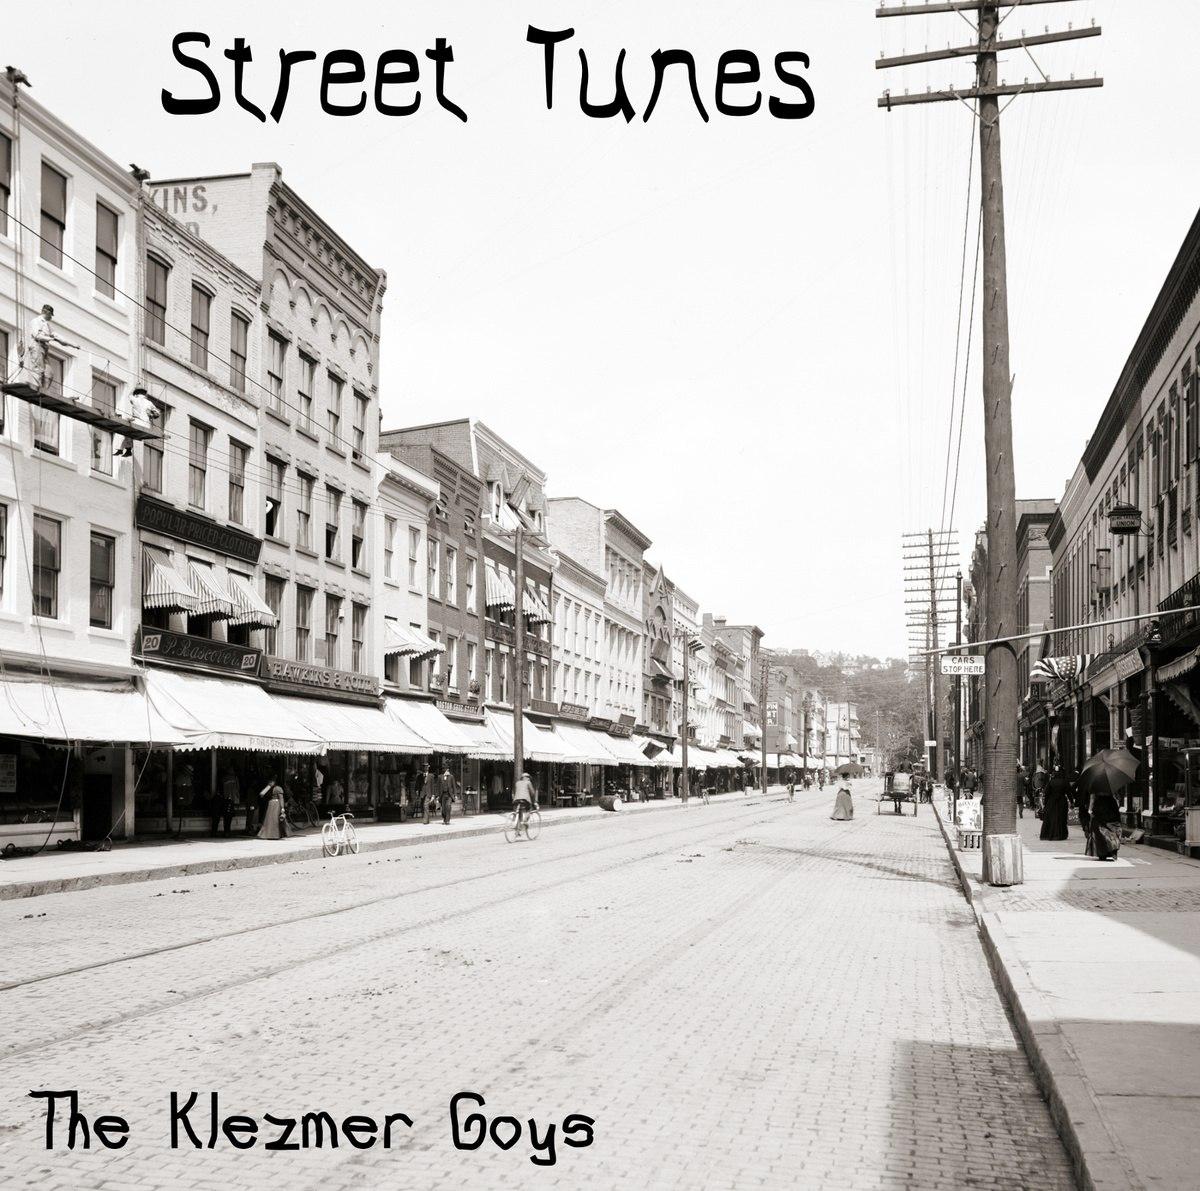 The Klezmer Goys - Street Tunes (2014)